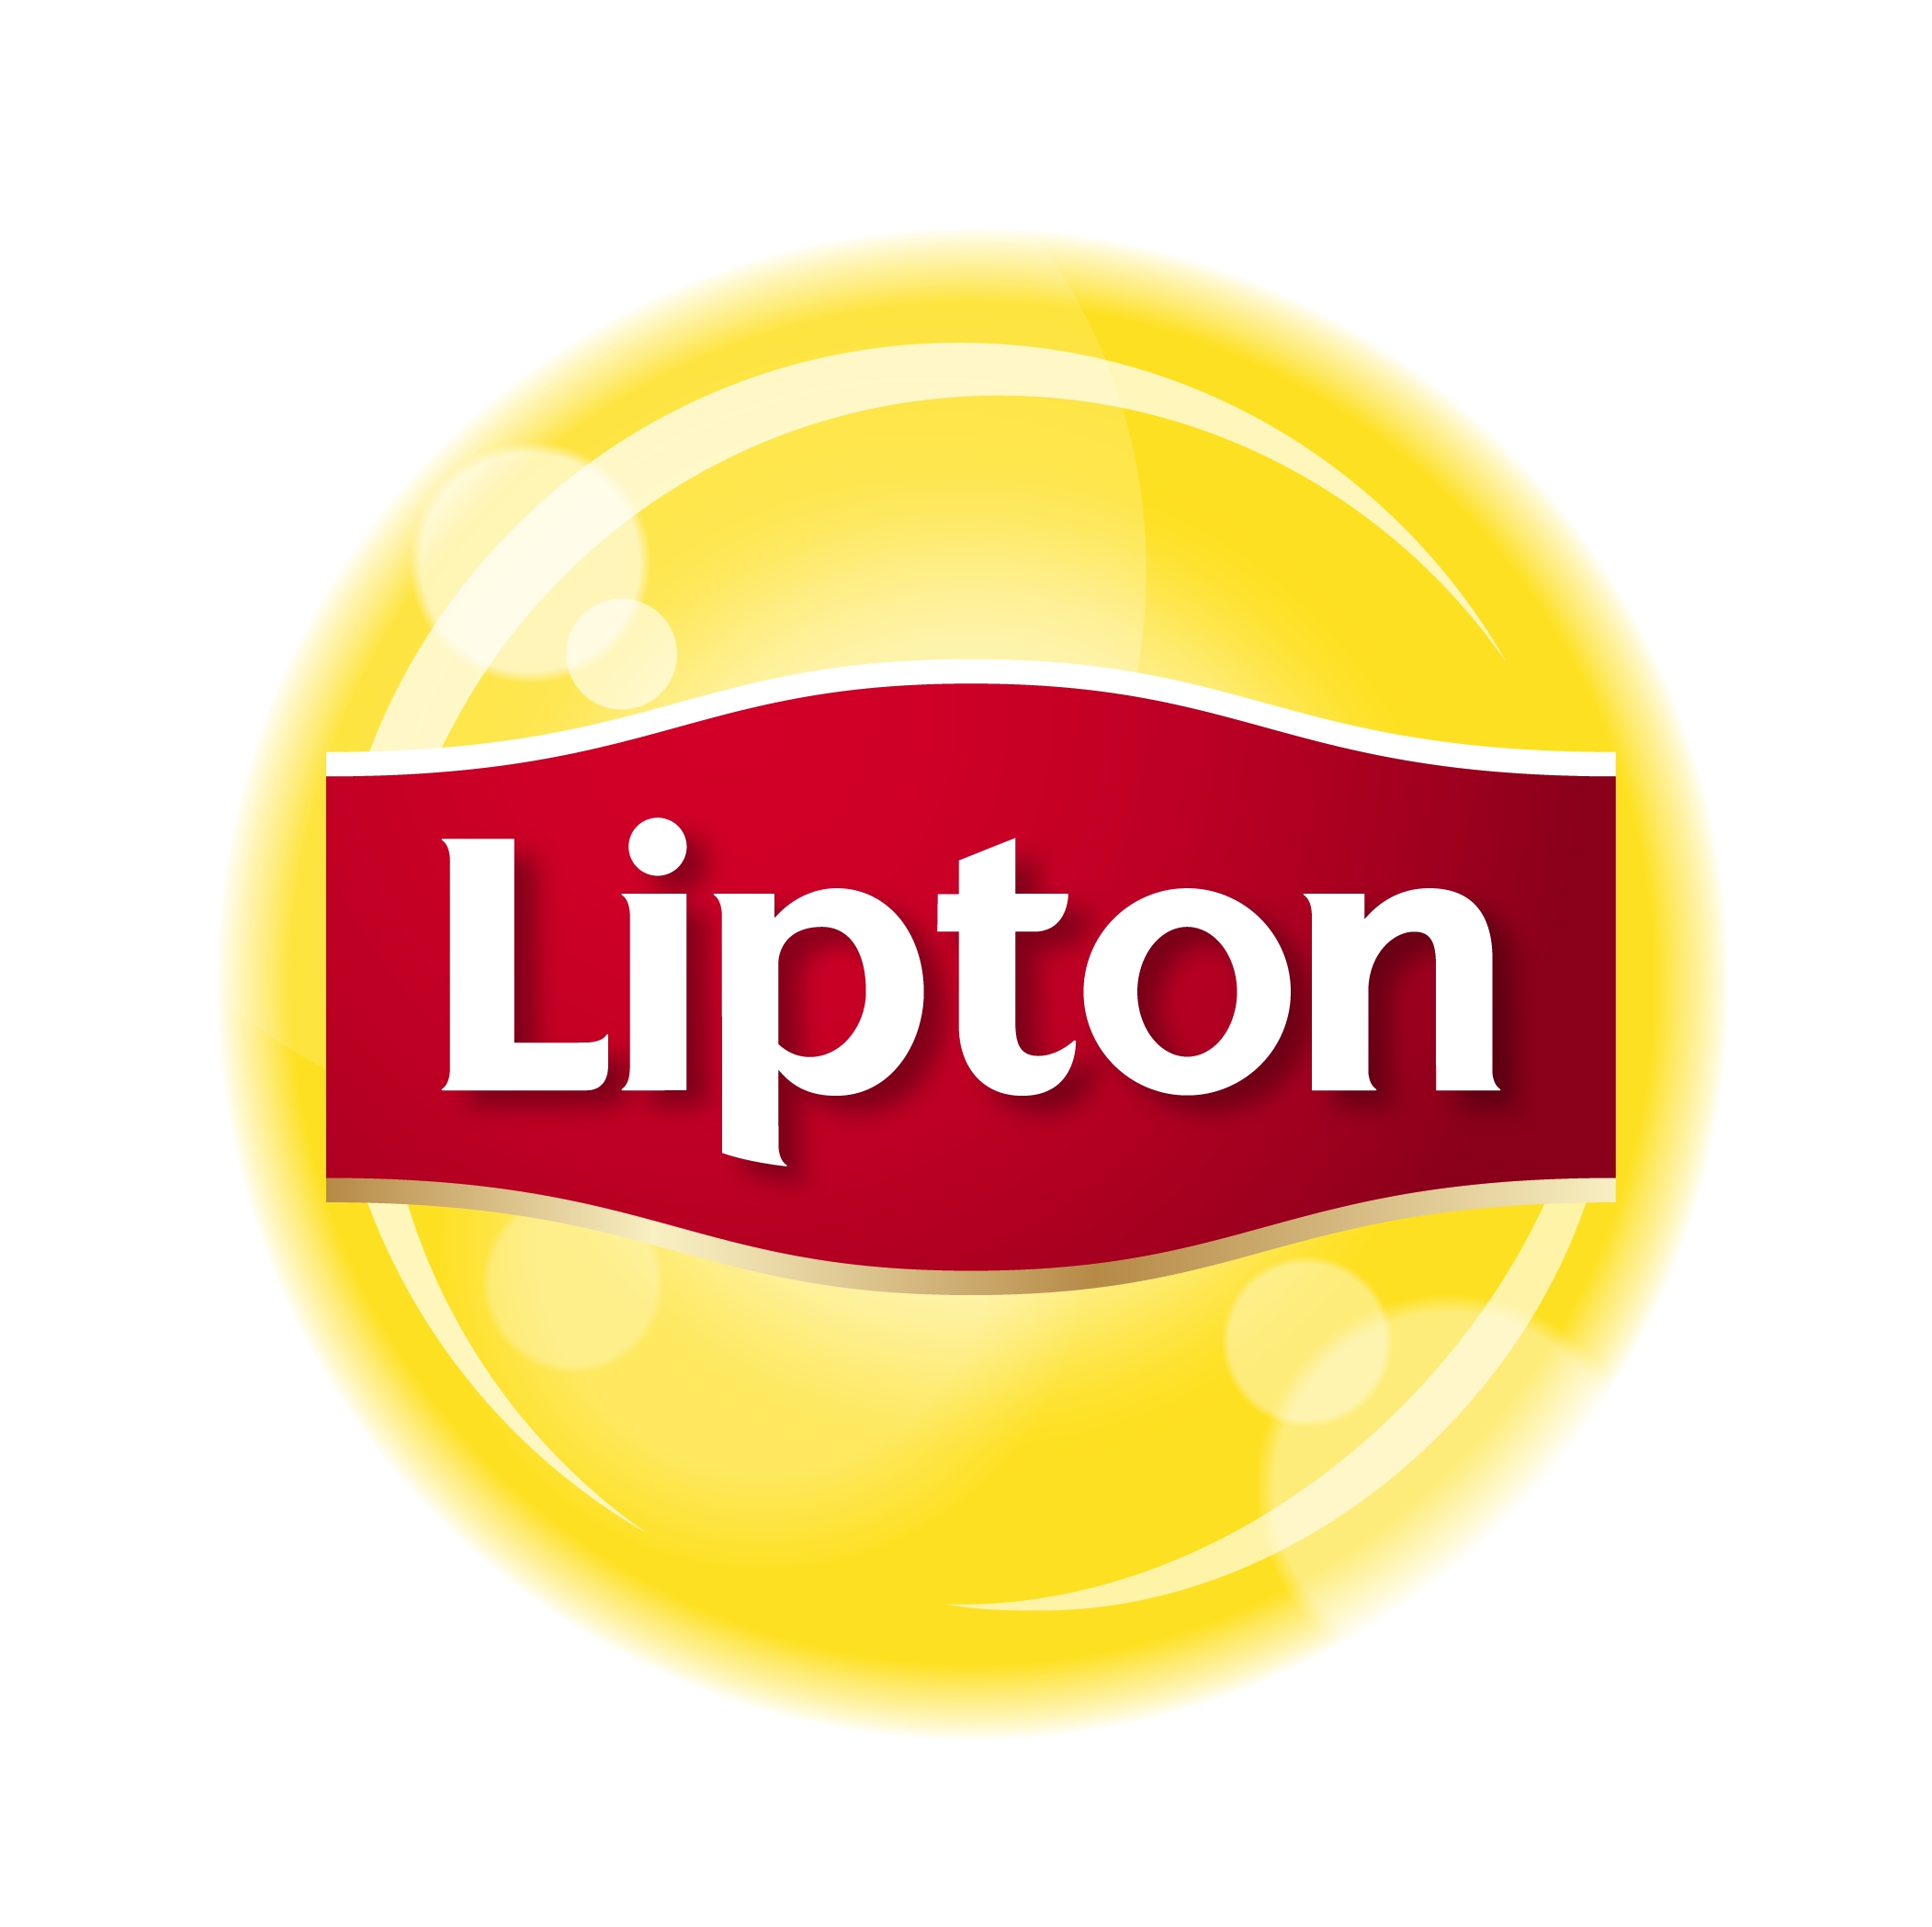 lipton-logo.jpg